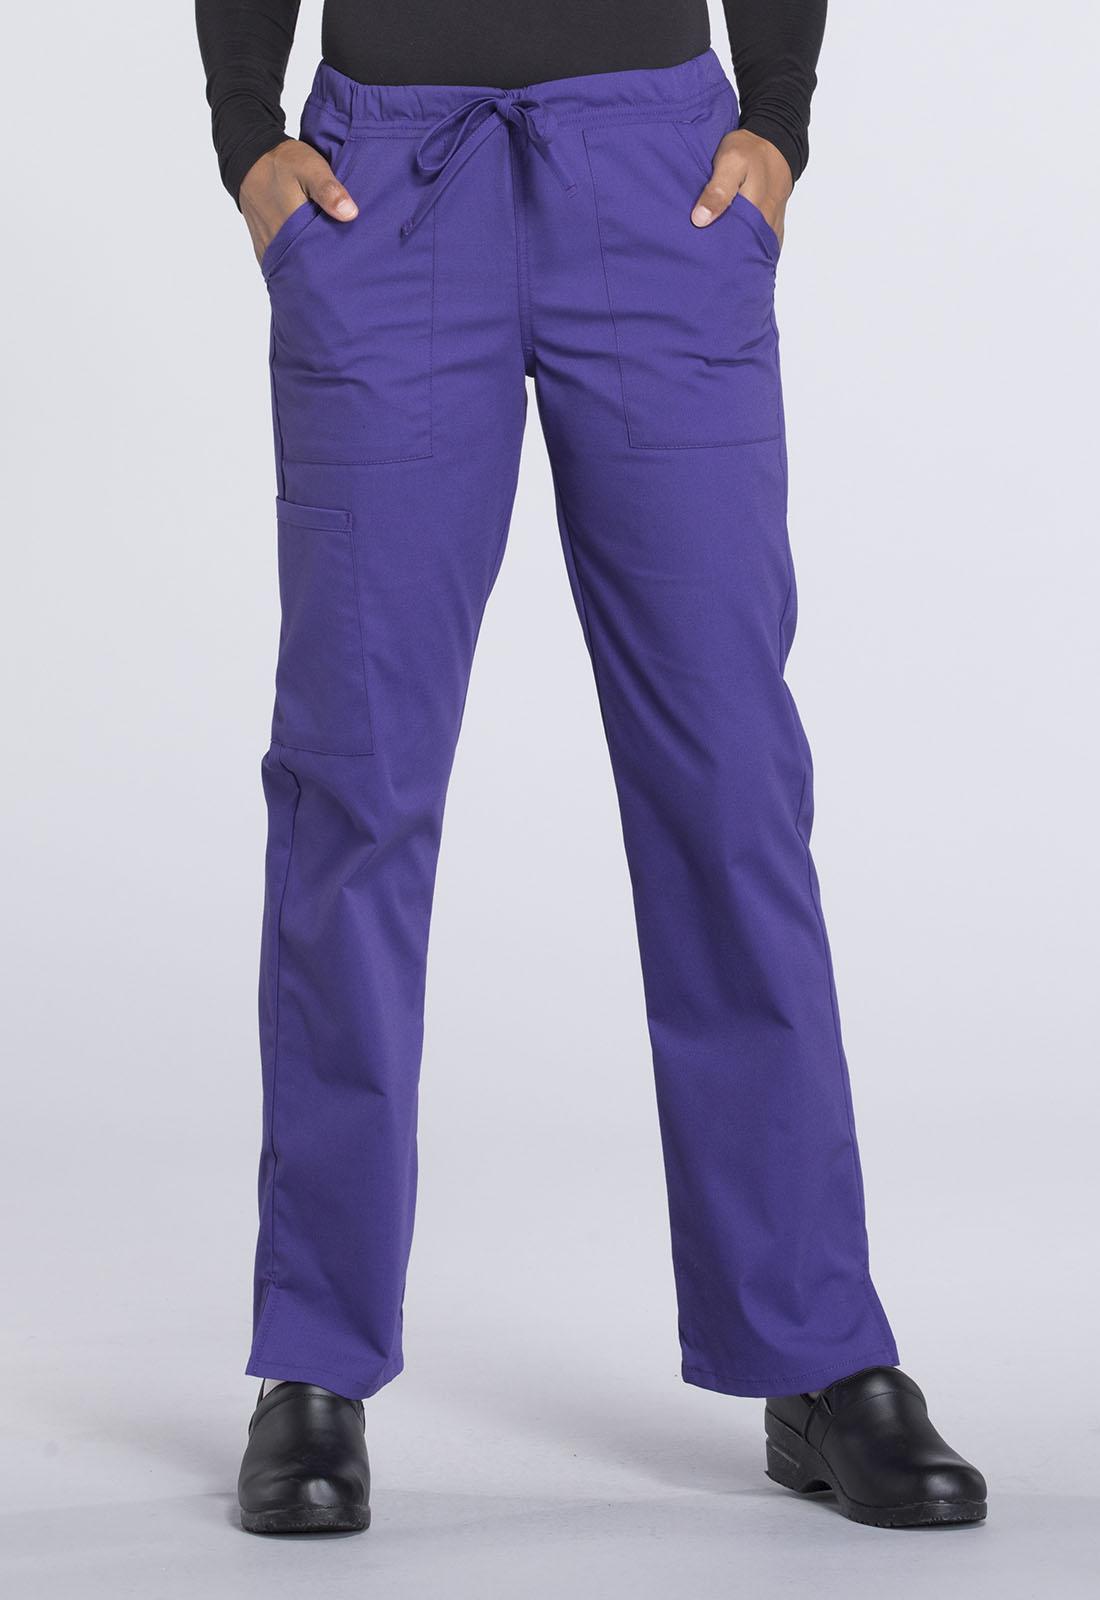 e0502bdc678 WW Professionals Women's Mid Rise Straight Leg Drawstring Pant Purple